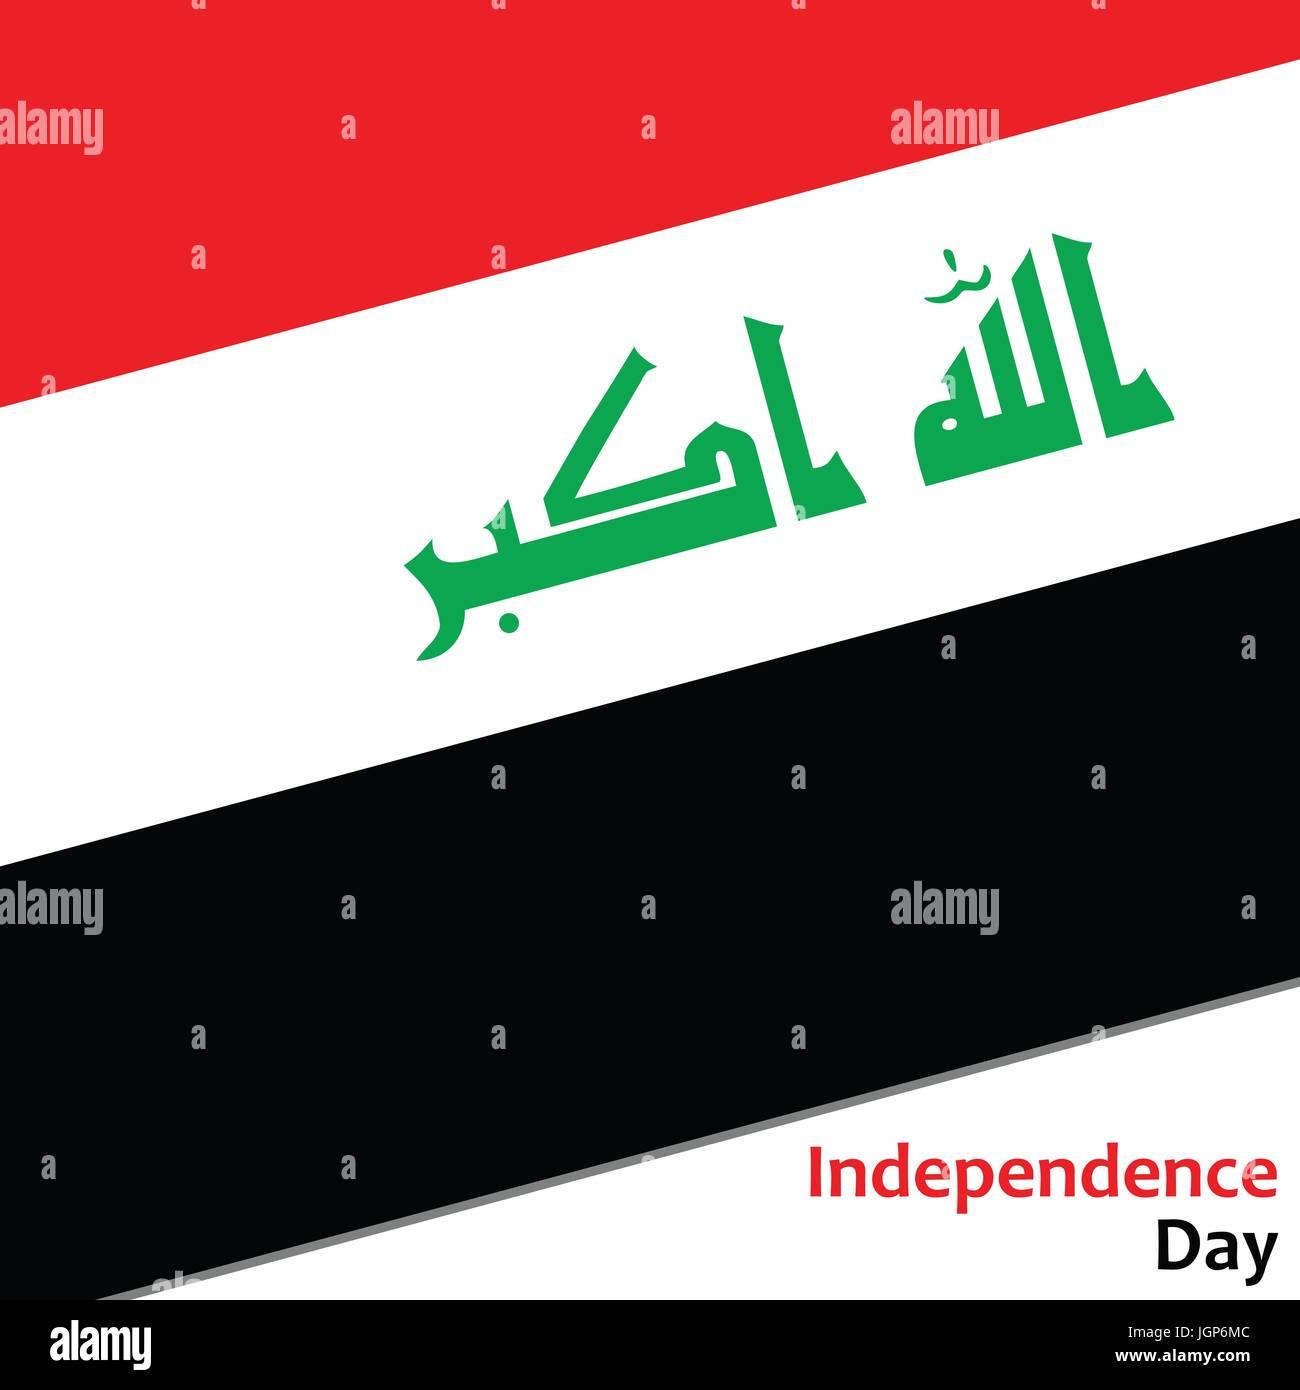 Irak independence day - Stock Image